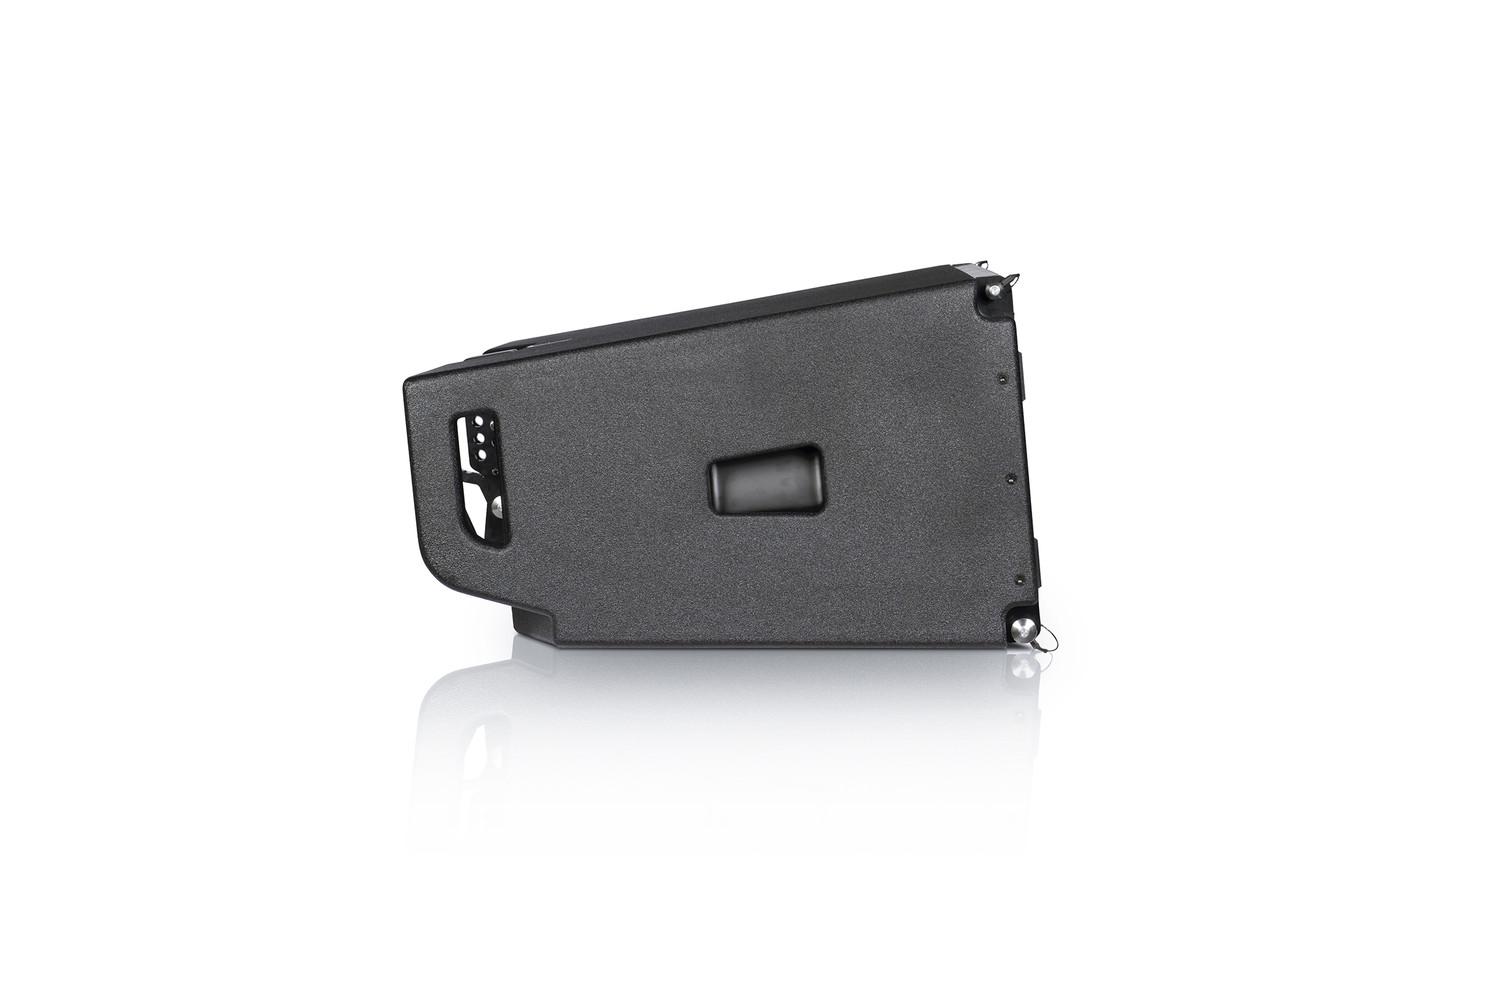 VioL210-side-dbtechnologies-23052016.jpg